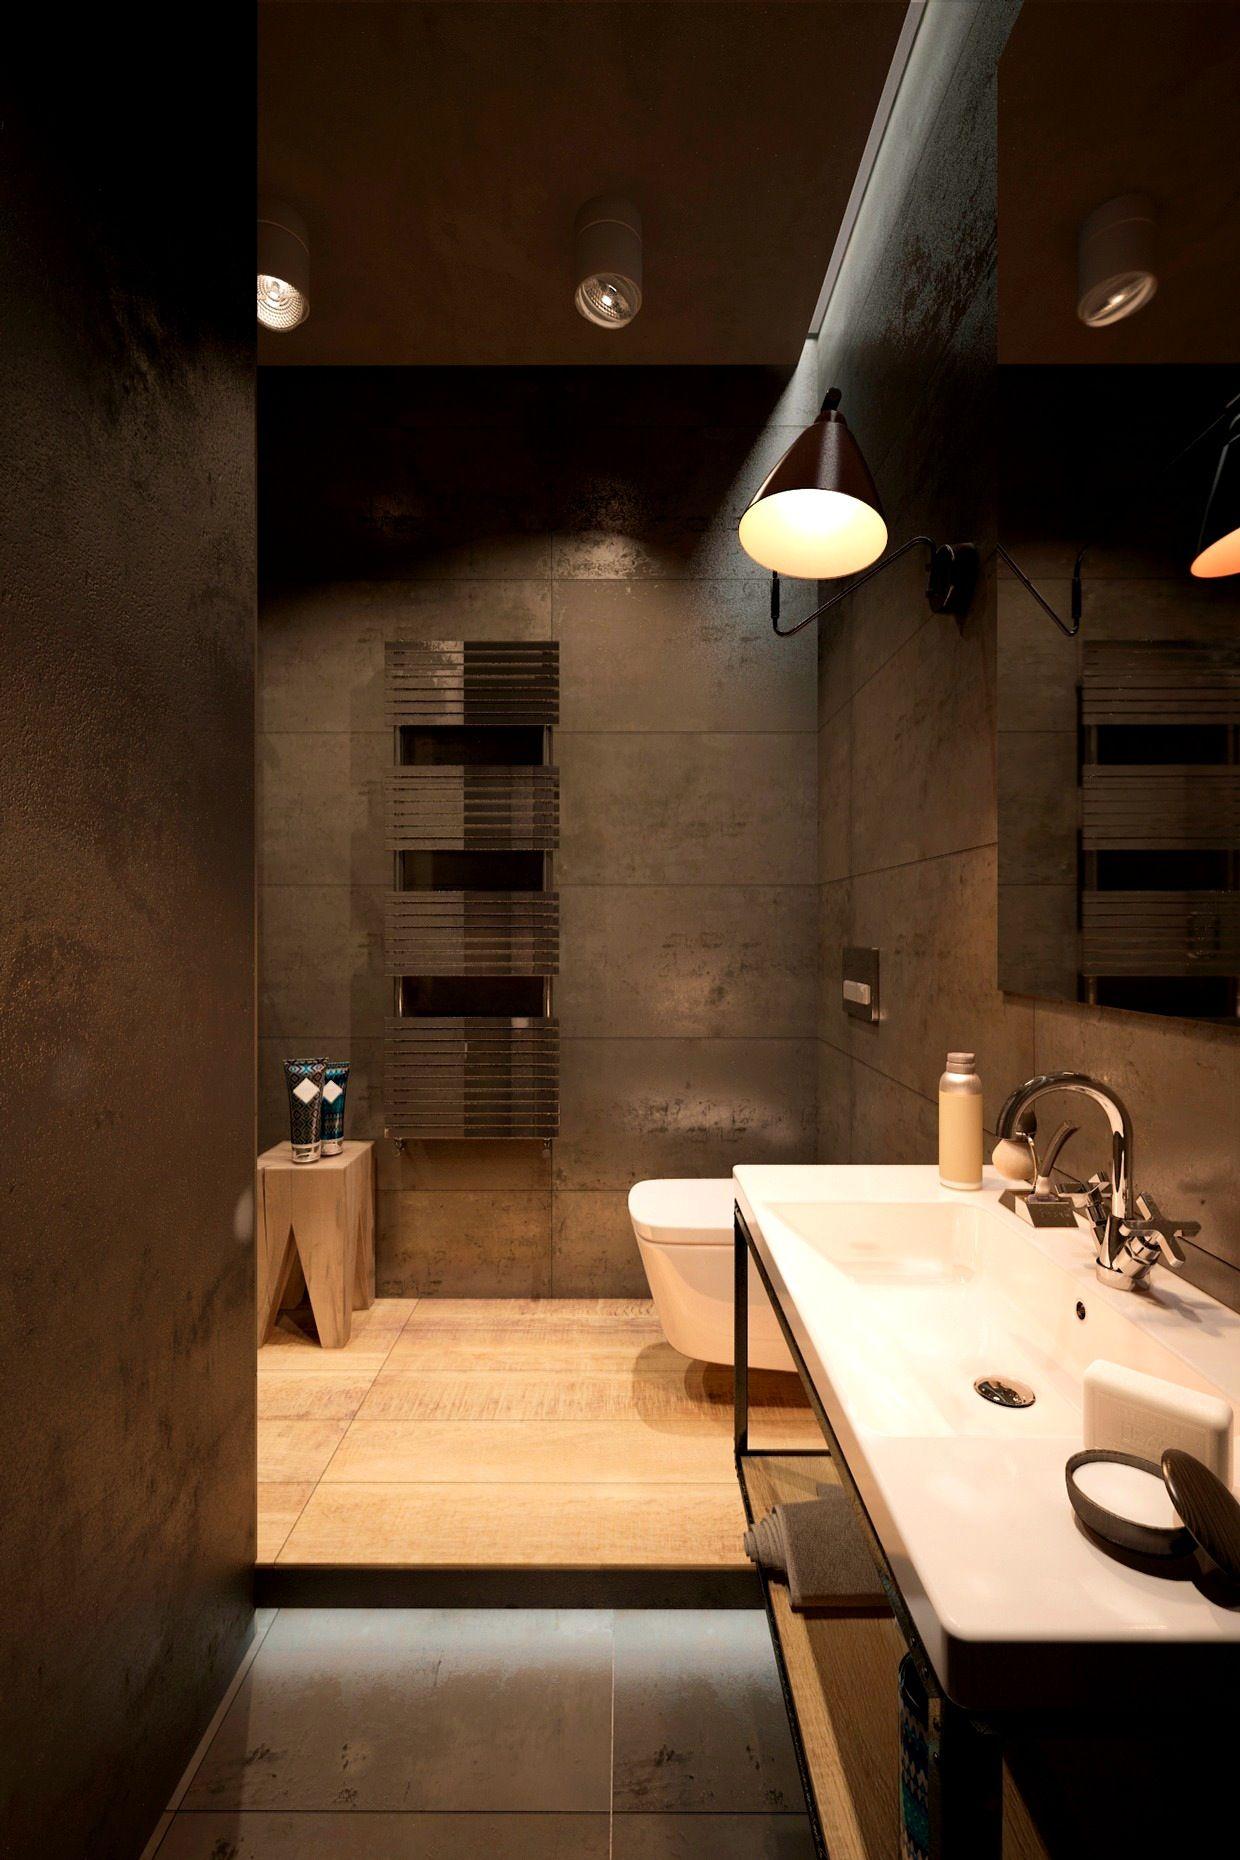 Accessoriesendearing Concrete Bathroom Design Interior Ideas Industrial Fixtures Desi Industrial Bathroom Decor Concrete Bathroom Design Industrial Home Design